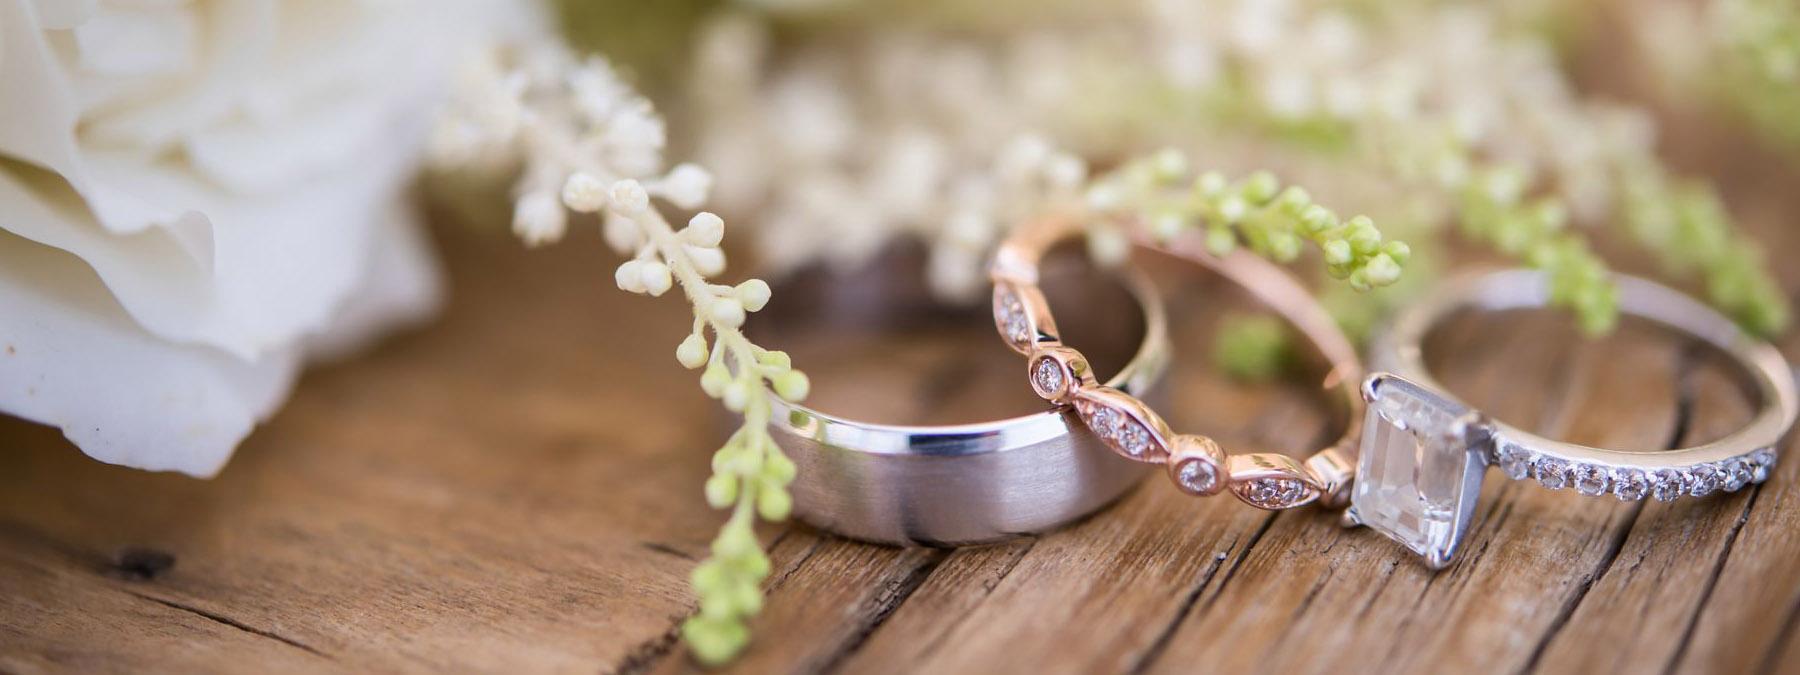 matrimonio all'aperto a Roma - casina valadier